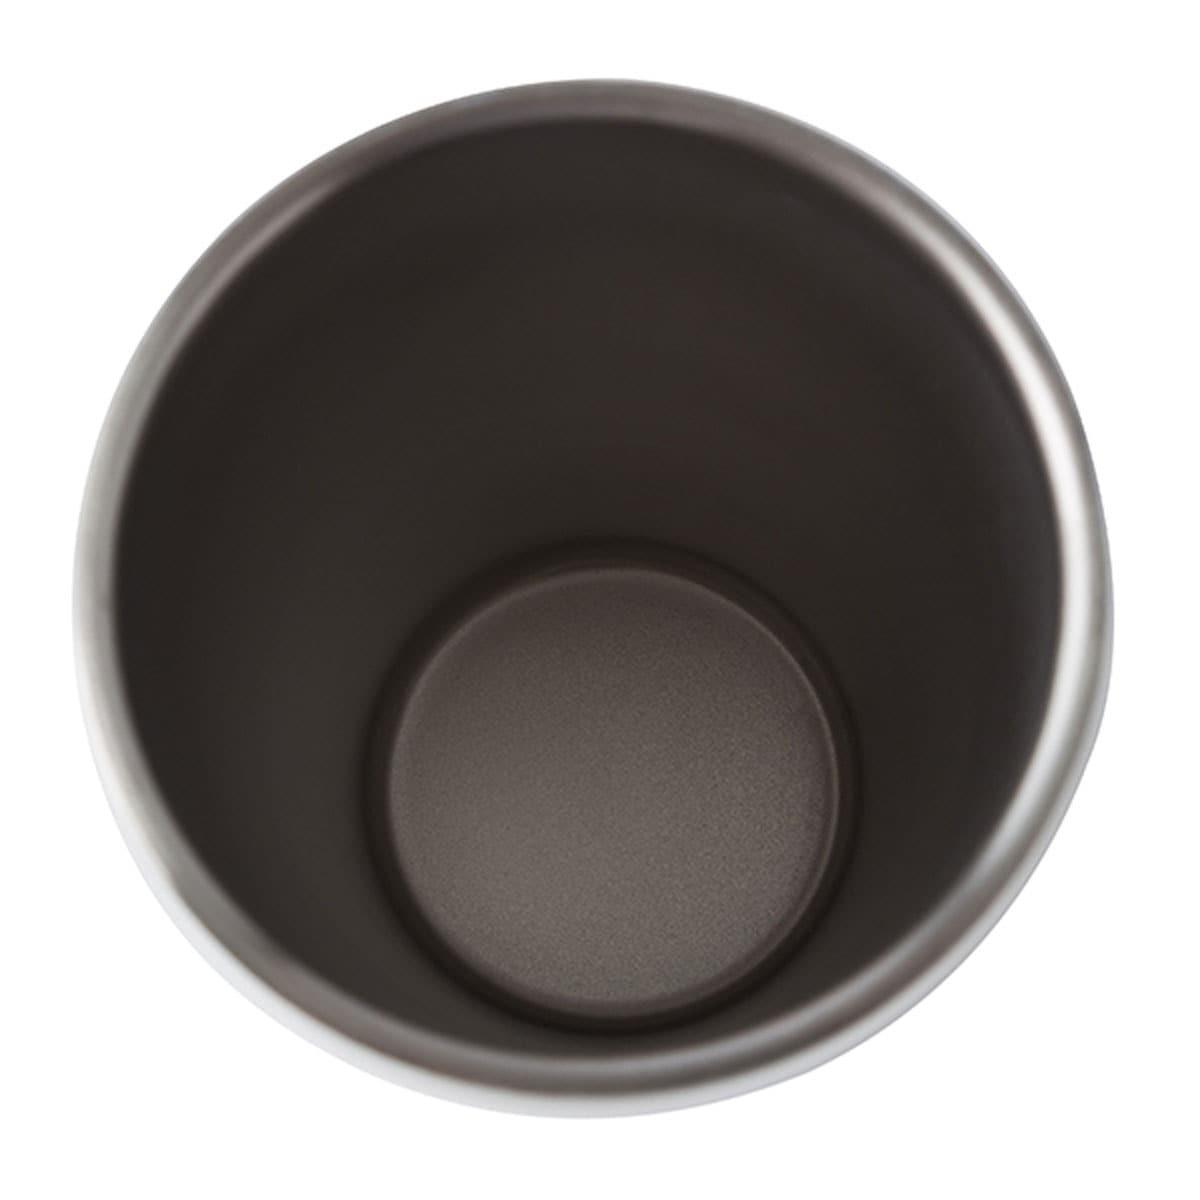 NITORI(ニトリ) ステンレスタンブラー(ホワイト)の商品画像